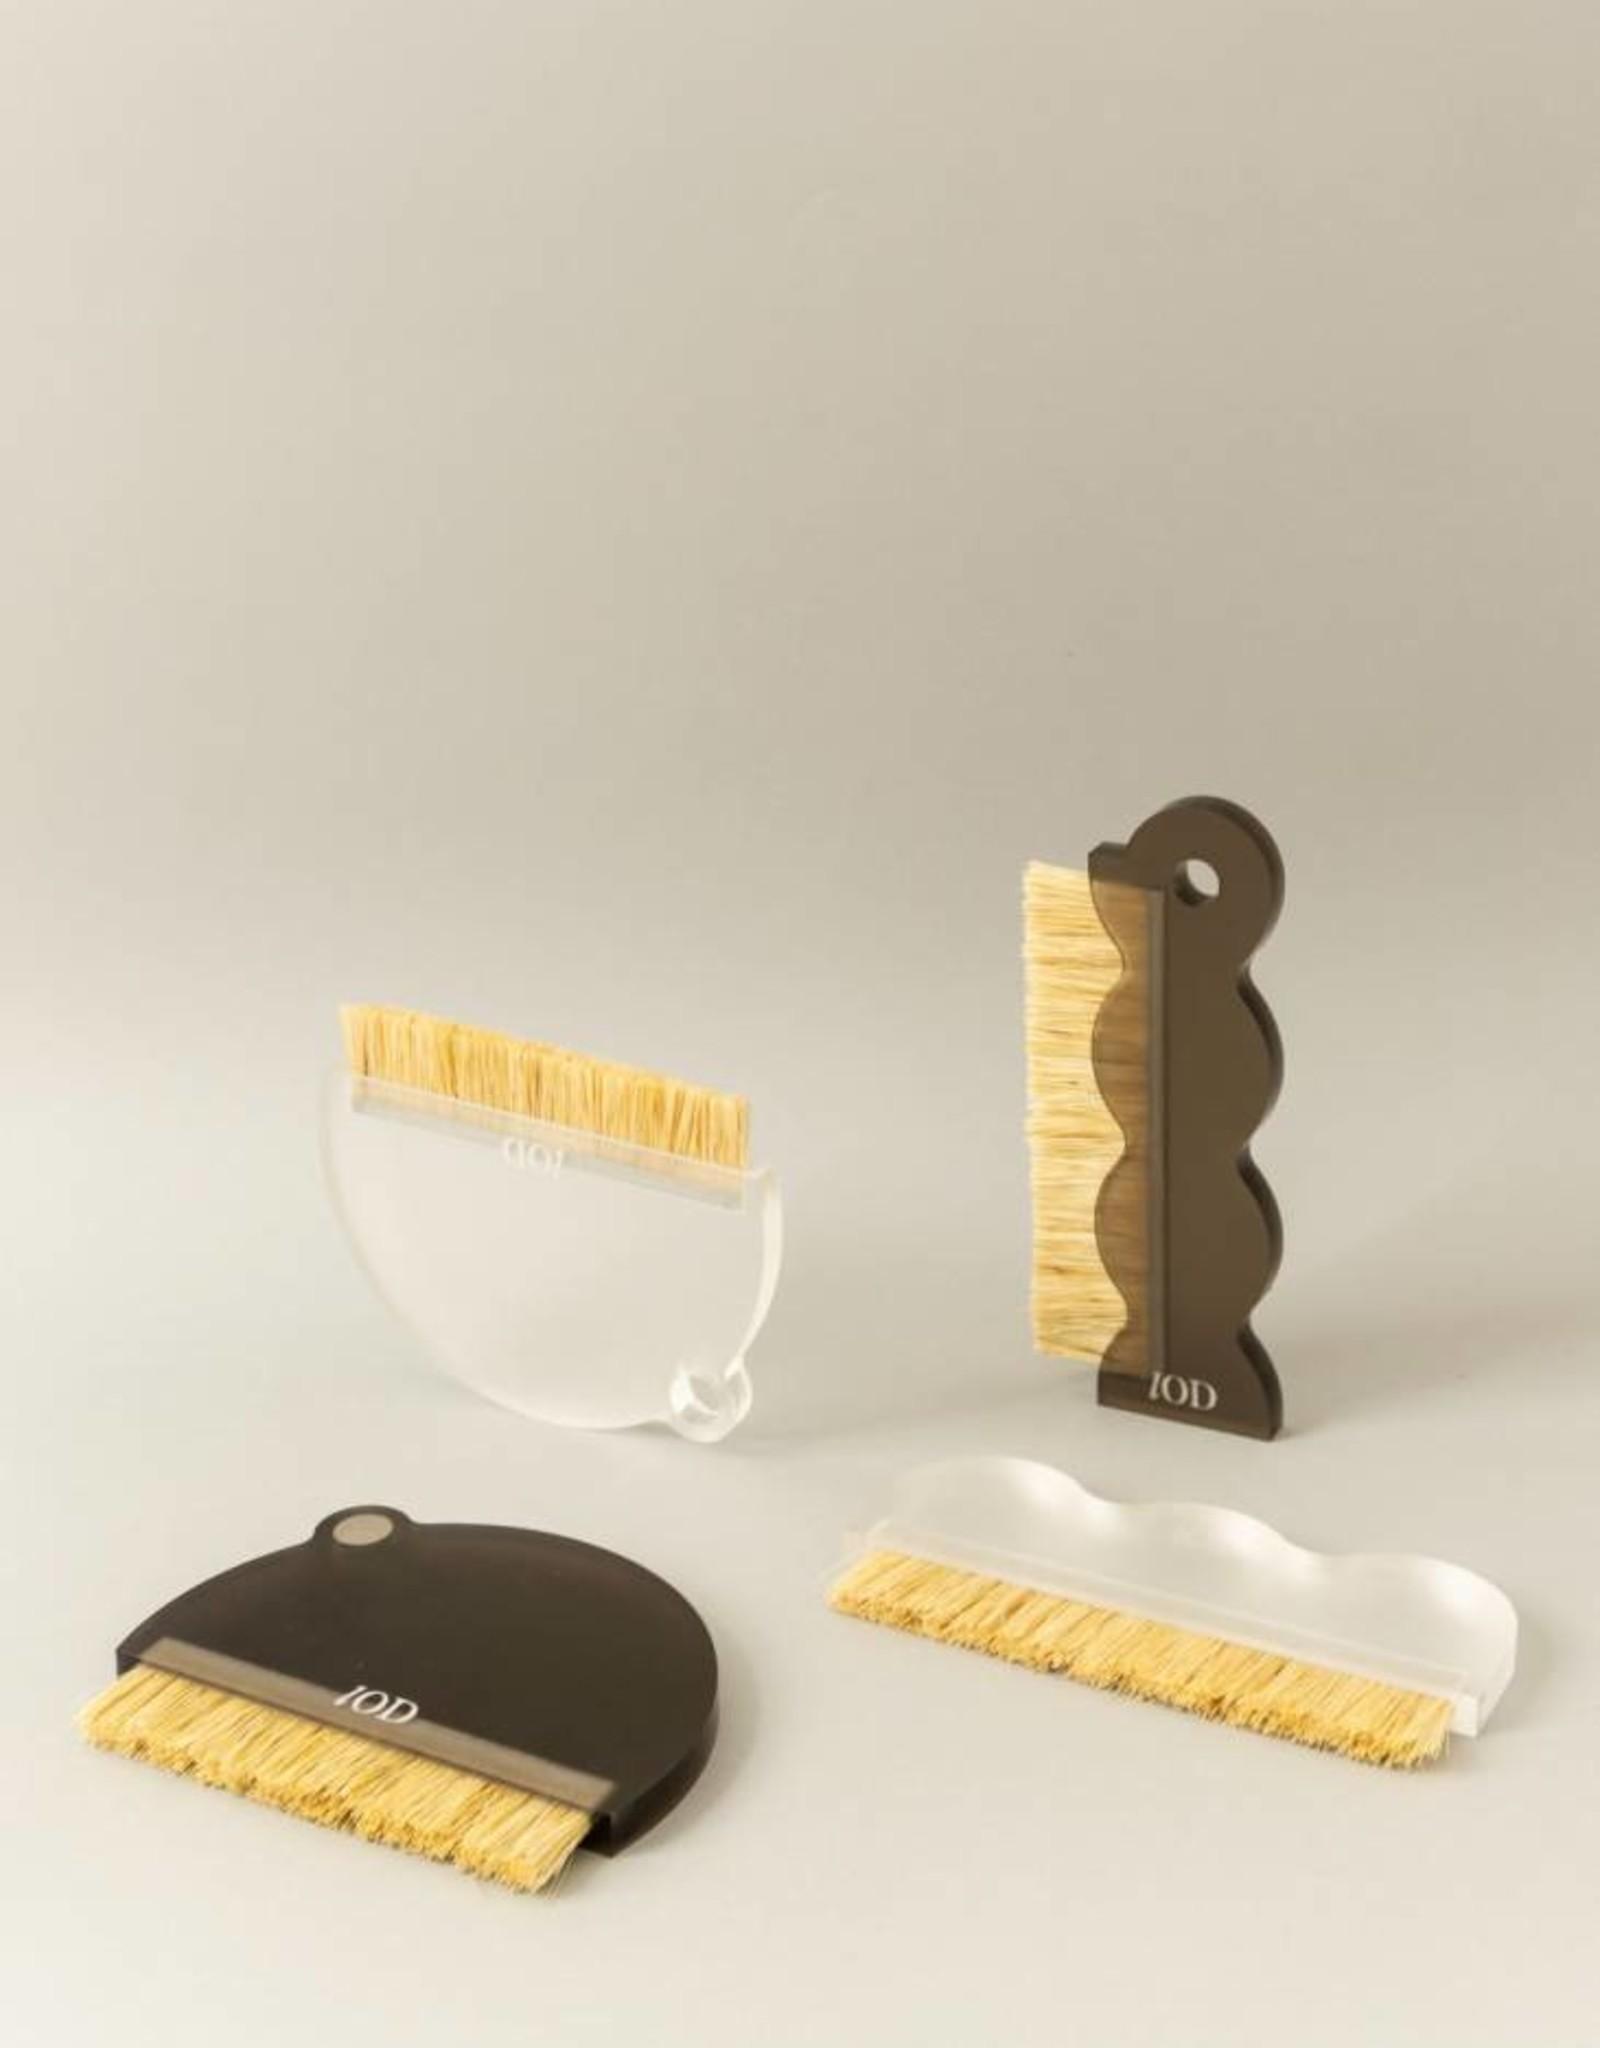 Les Objetos Decorativos Methacrylate Brush